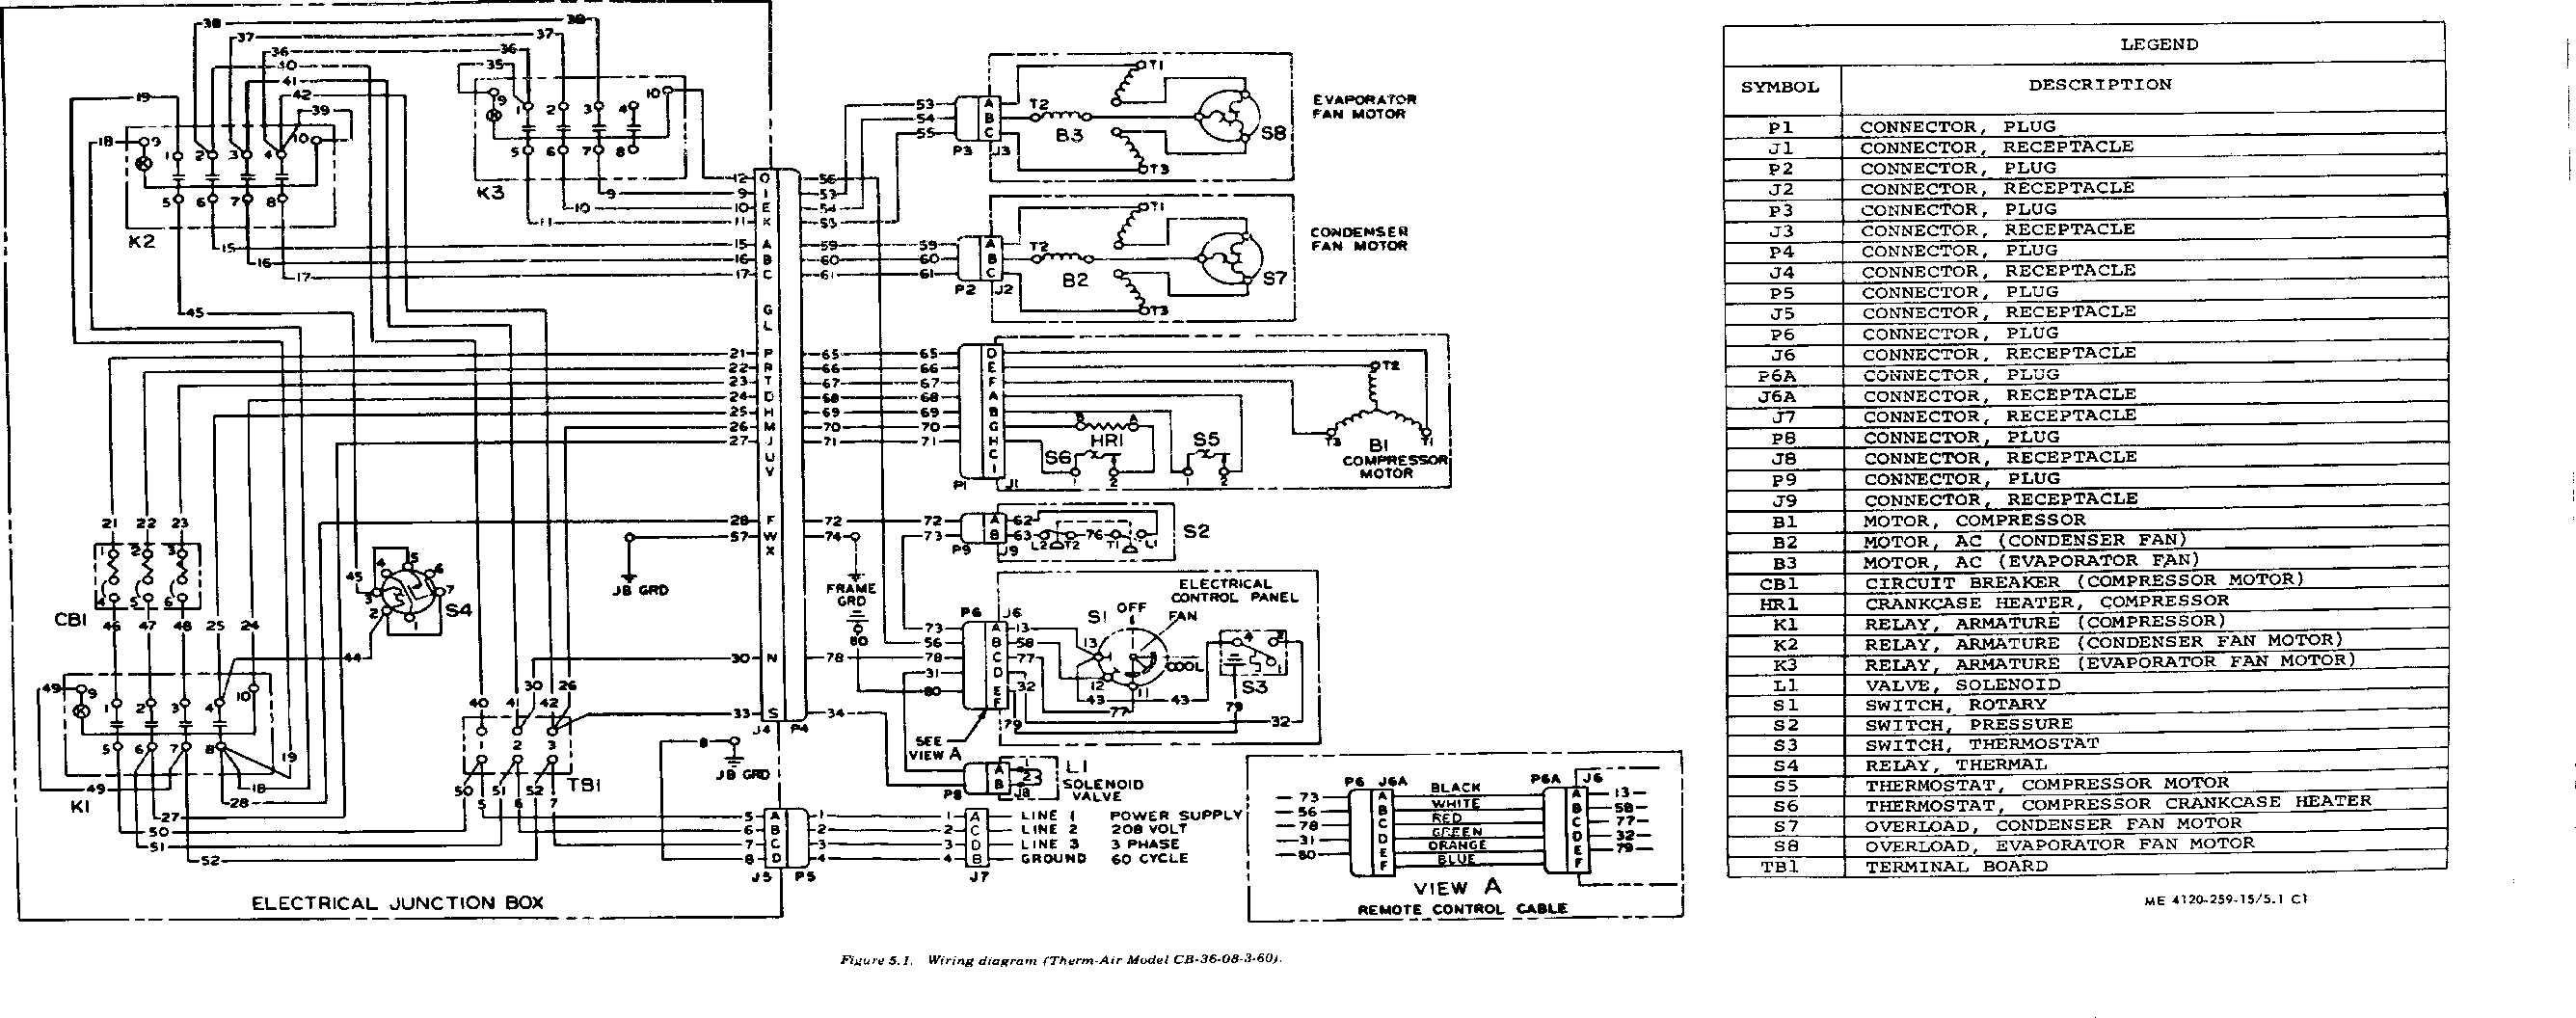 Payne Heat Pump Thermostatng Diagram Package Unit Trane Wiring